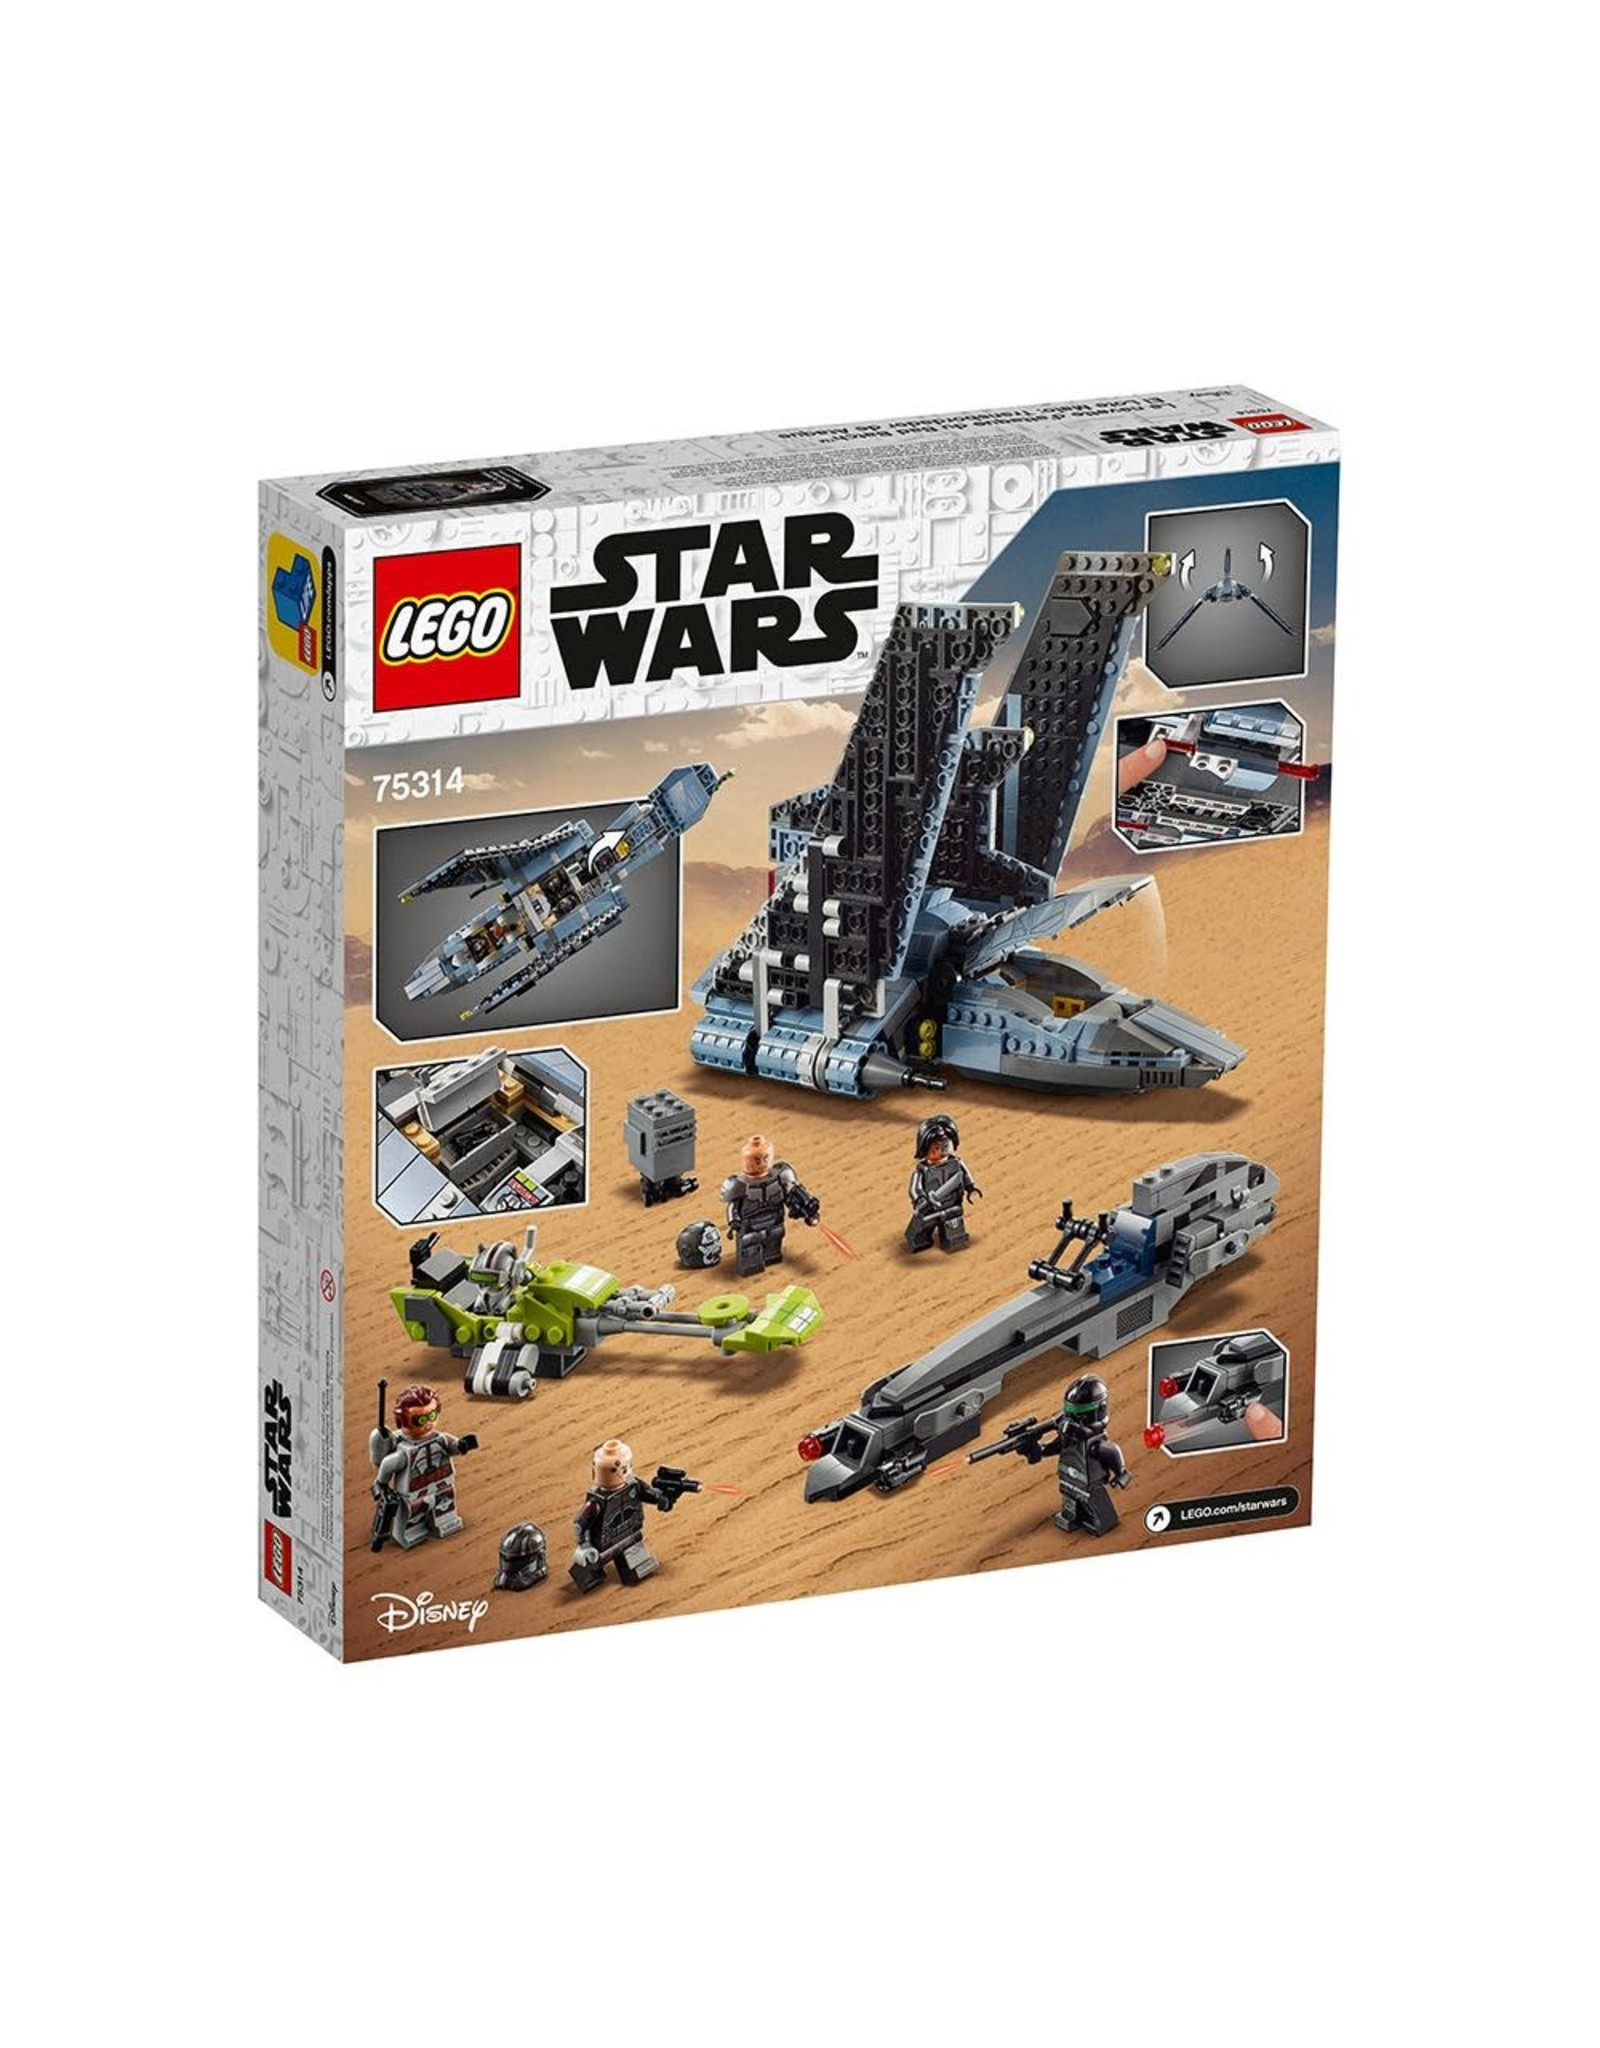 LEGO Star Wars 75314 The Bad Batch Attack Shuttle